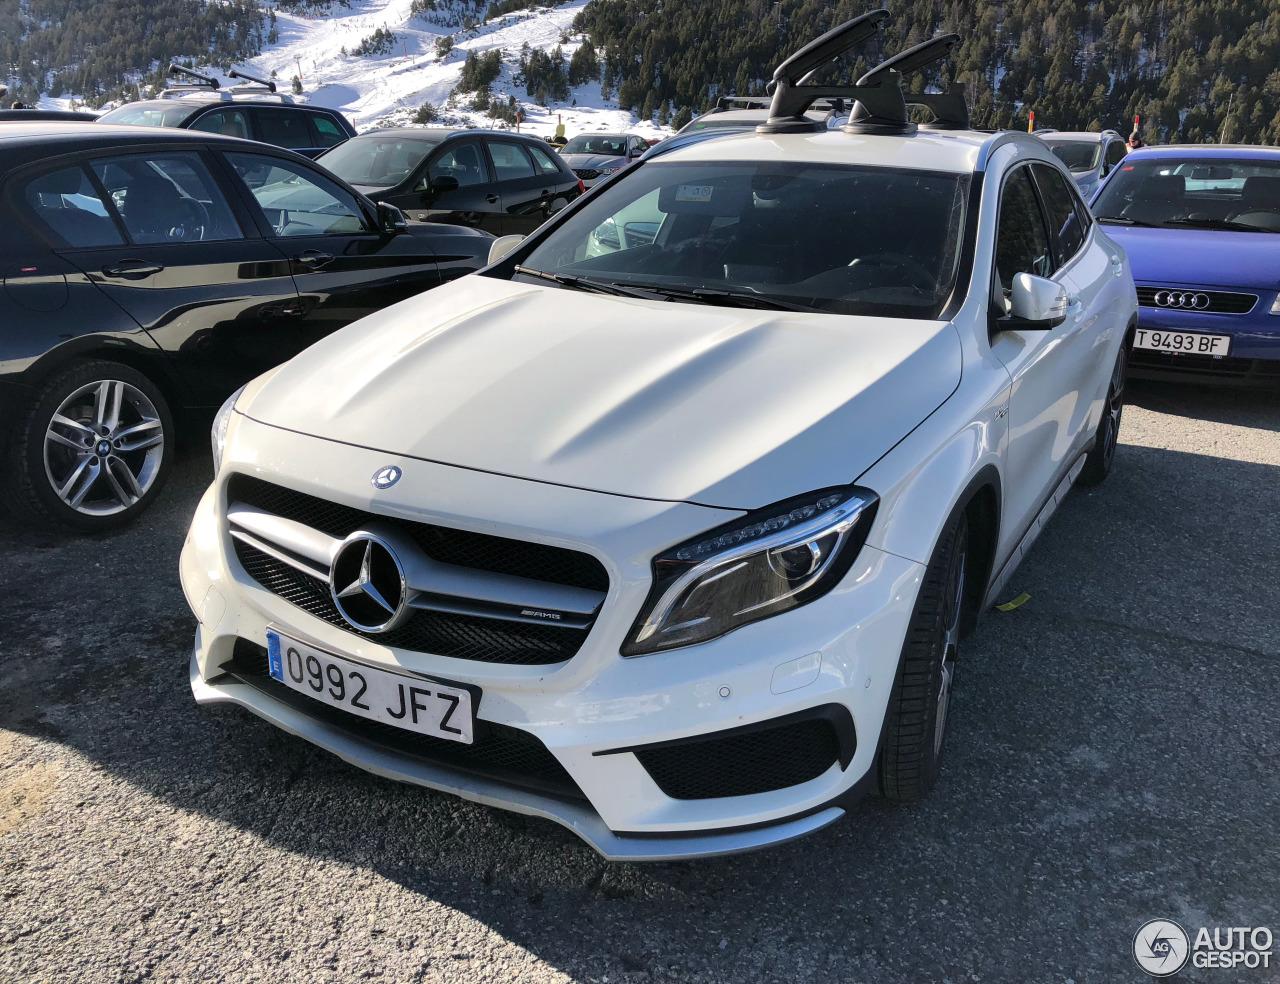 Mercedes benz gla 45 amg x156 10 december 2017 autogespot for 2017 amg gla 45 mercedes benz